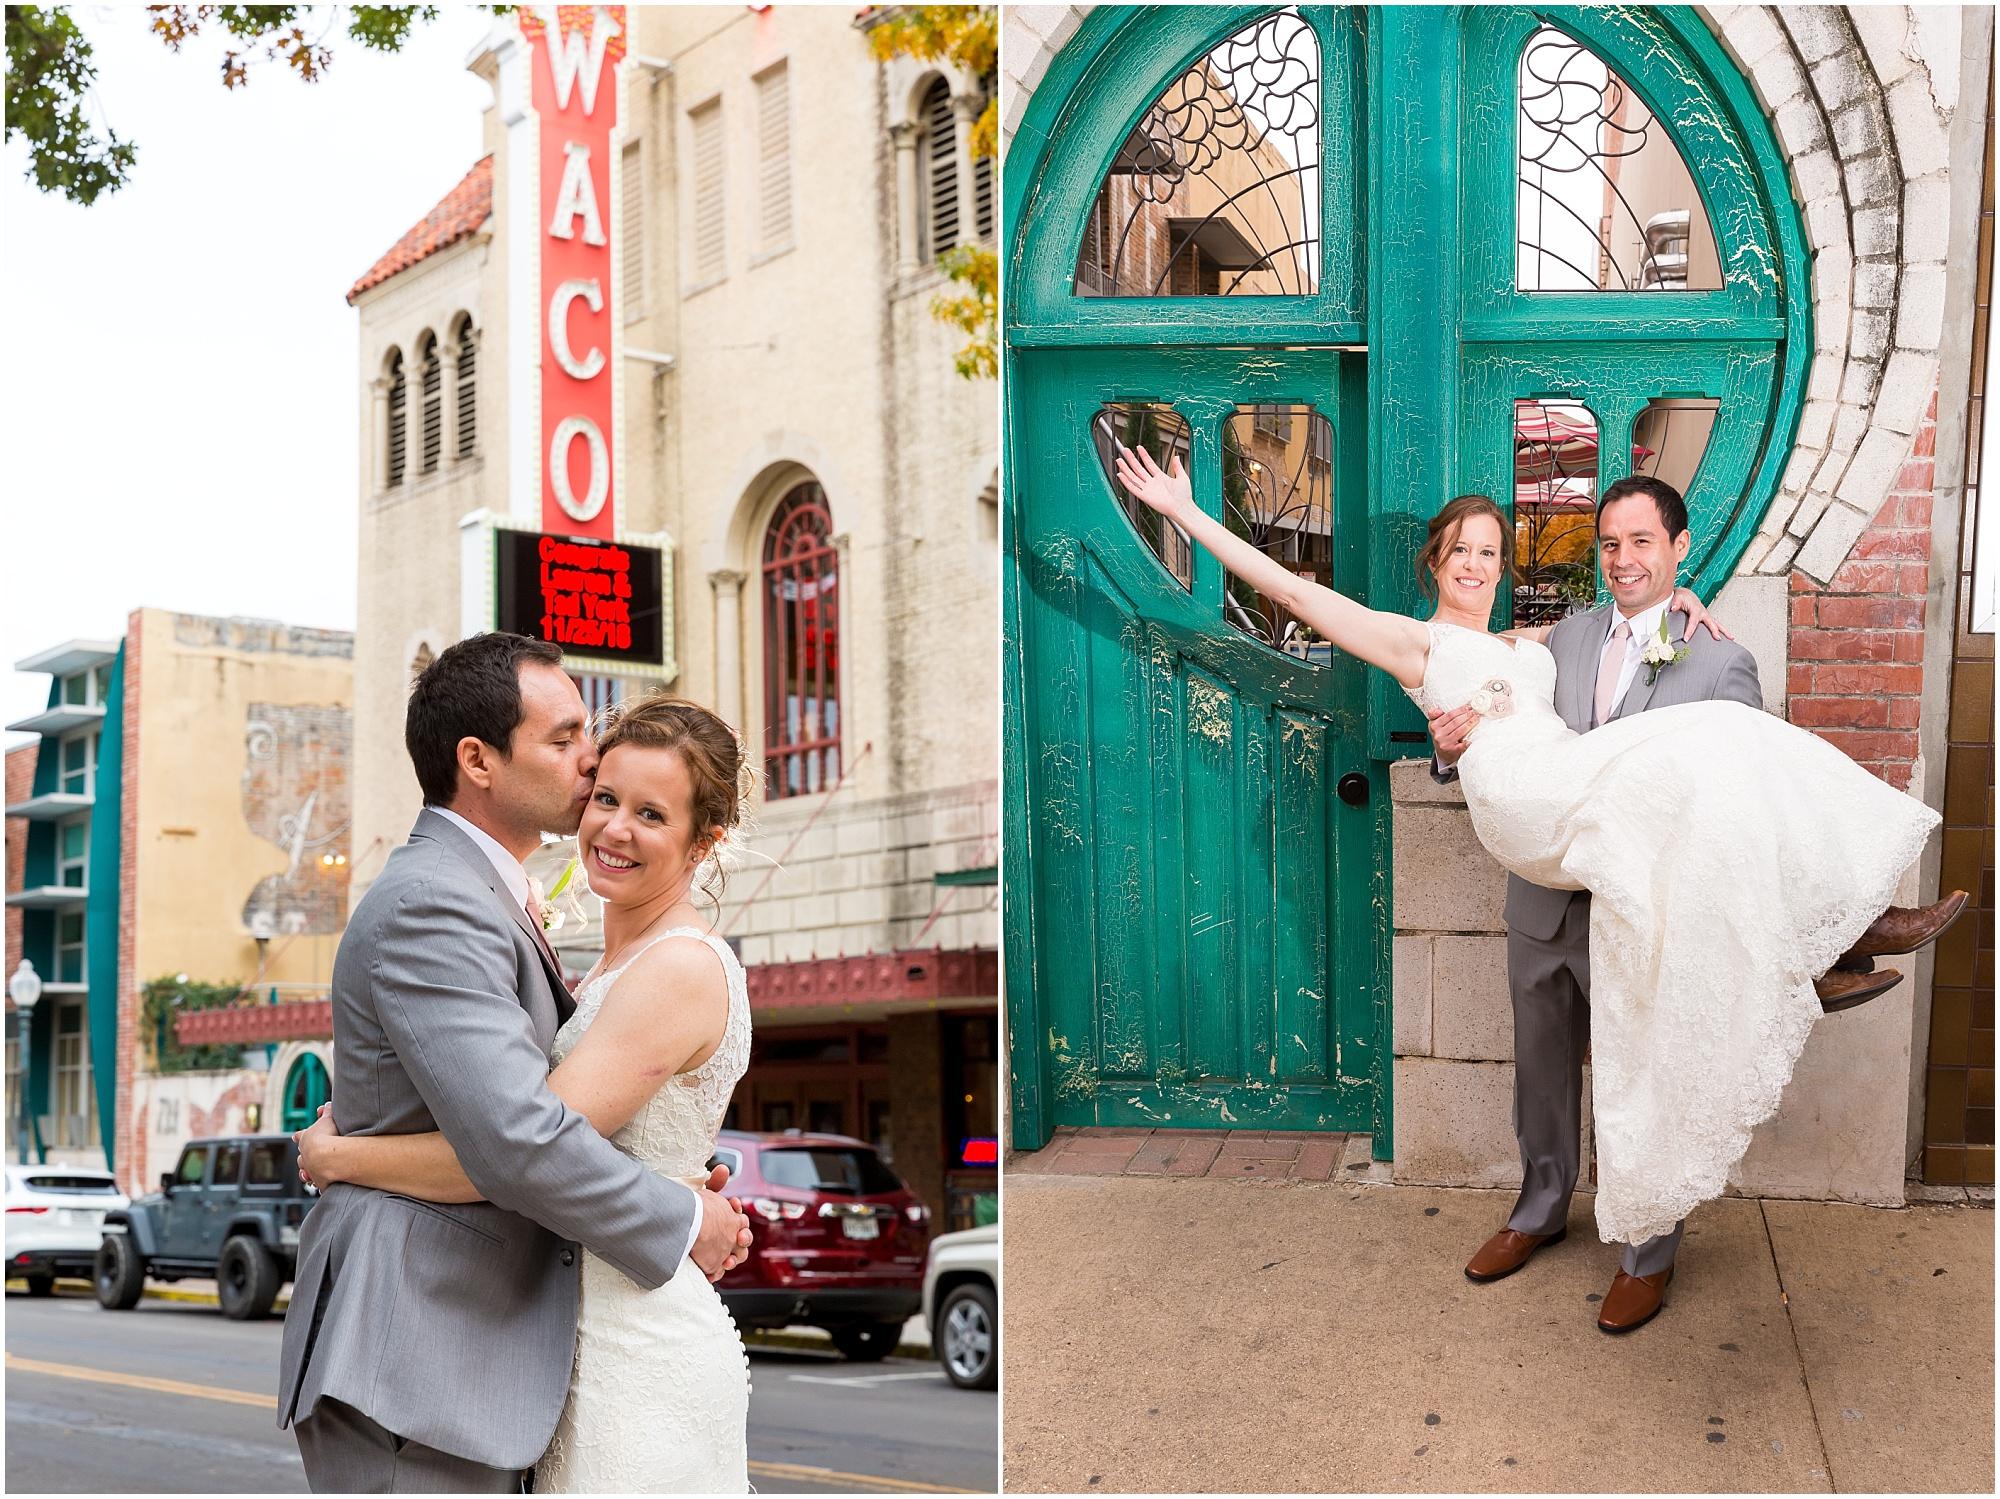 Bride and groom pose in front of The Hippodrome in Waco, Texas - Jason & Melaina Photography - www.jasonandmelaina.com